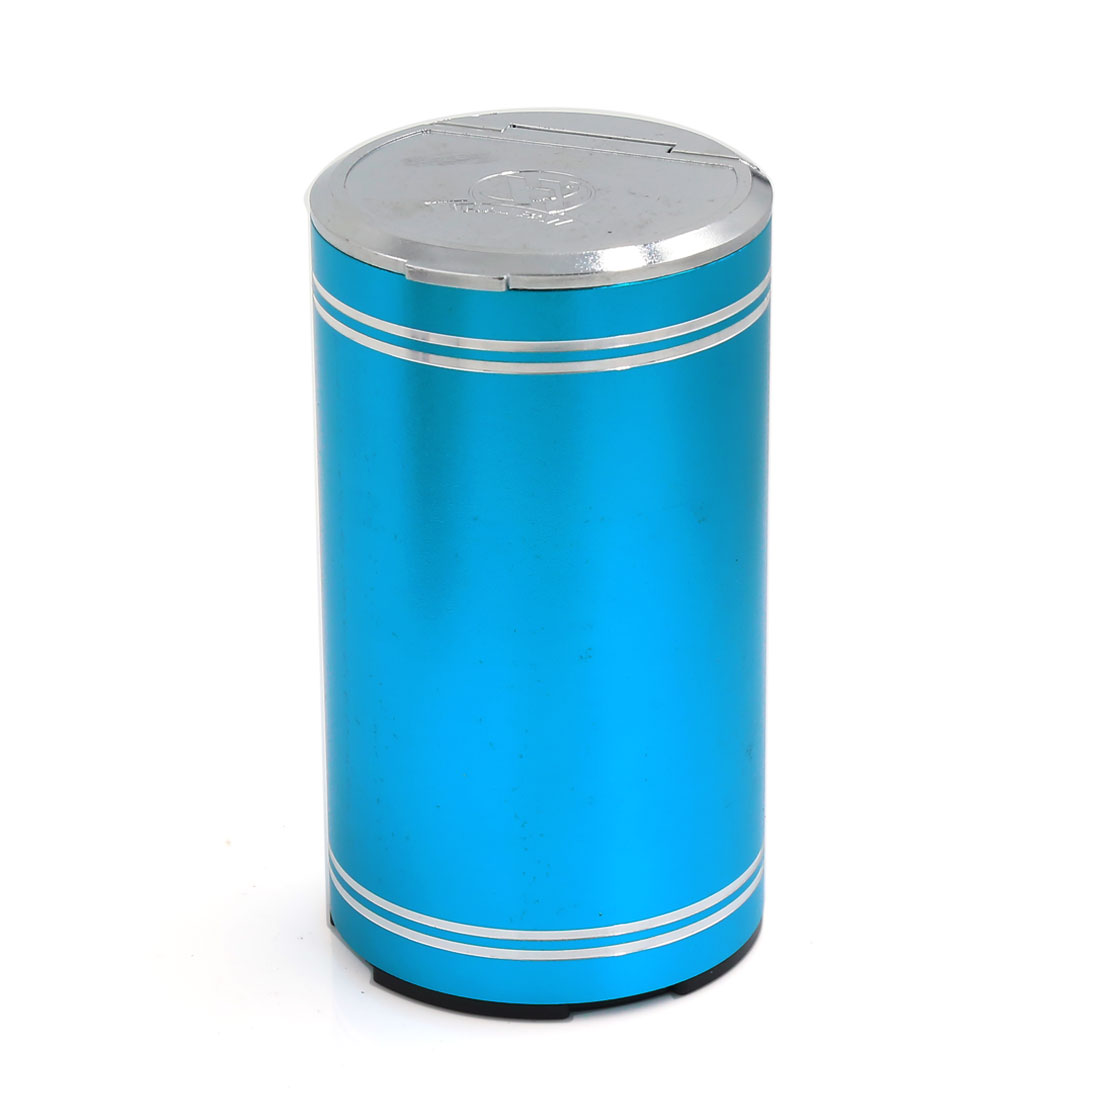 Blue Aluminum Alloy Cylinder Shape Cigarette Ashtray Ash Cup Holder for Car Home